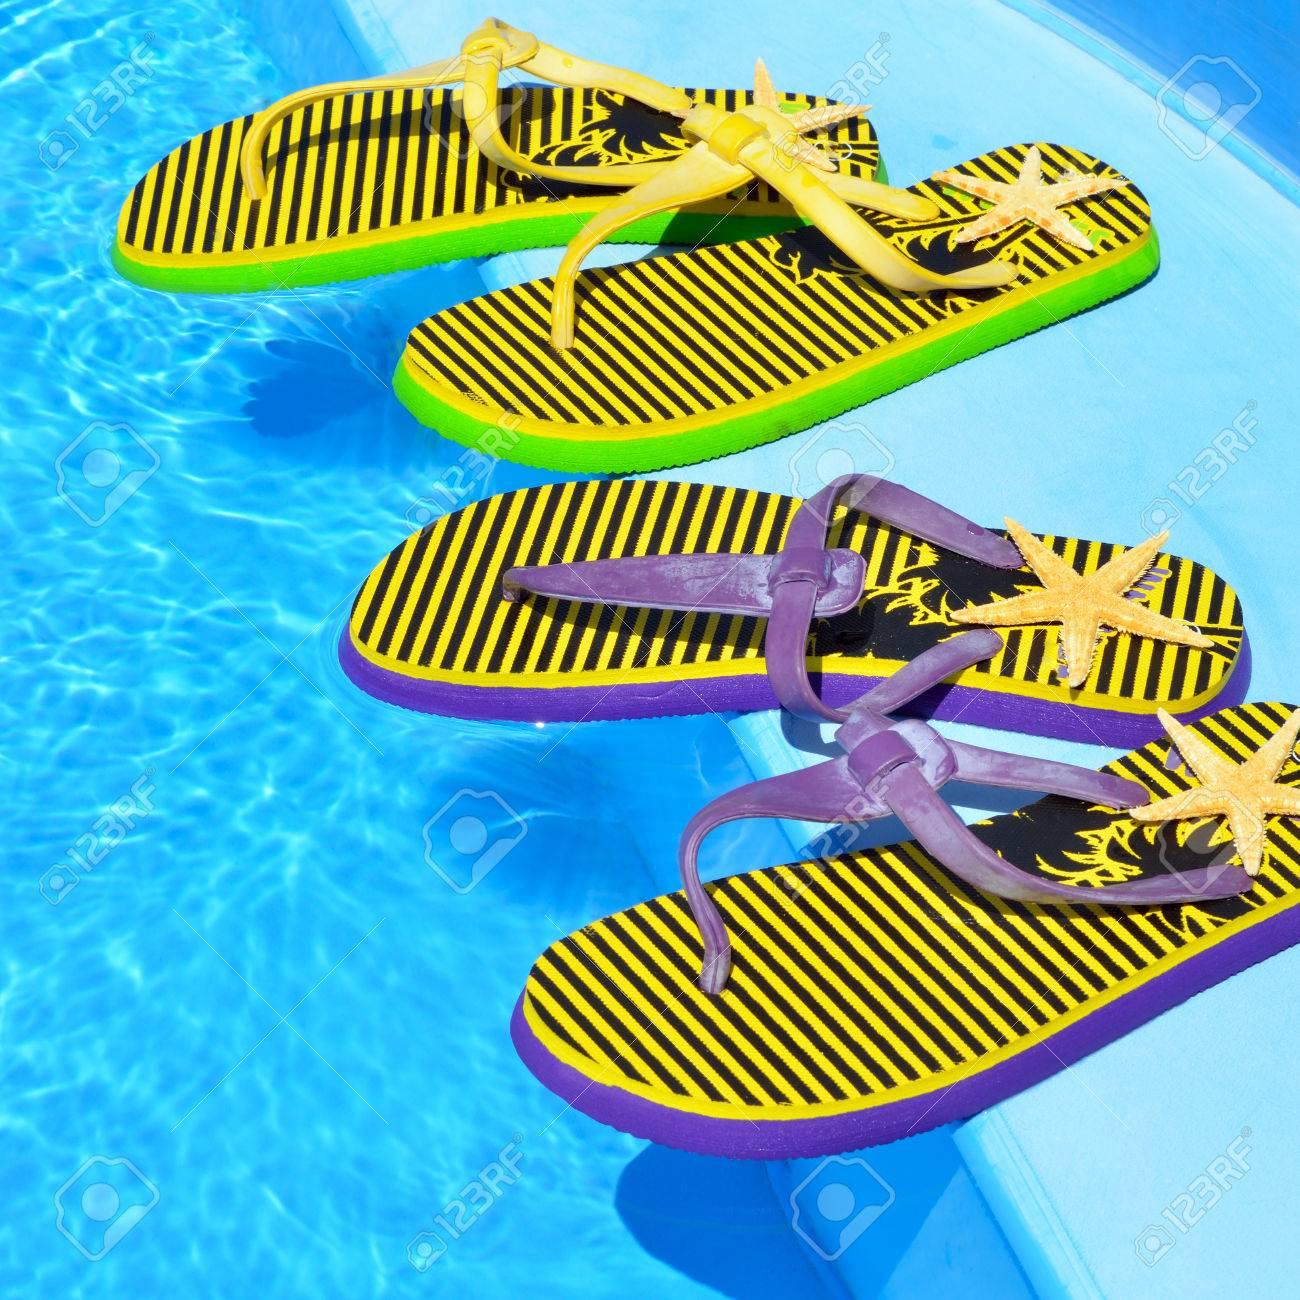 Flip-flops on the swimming pool. - 67008006